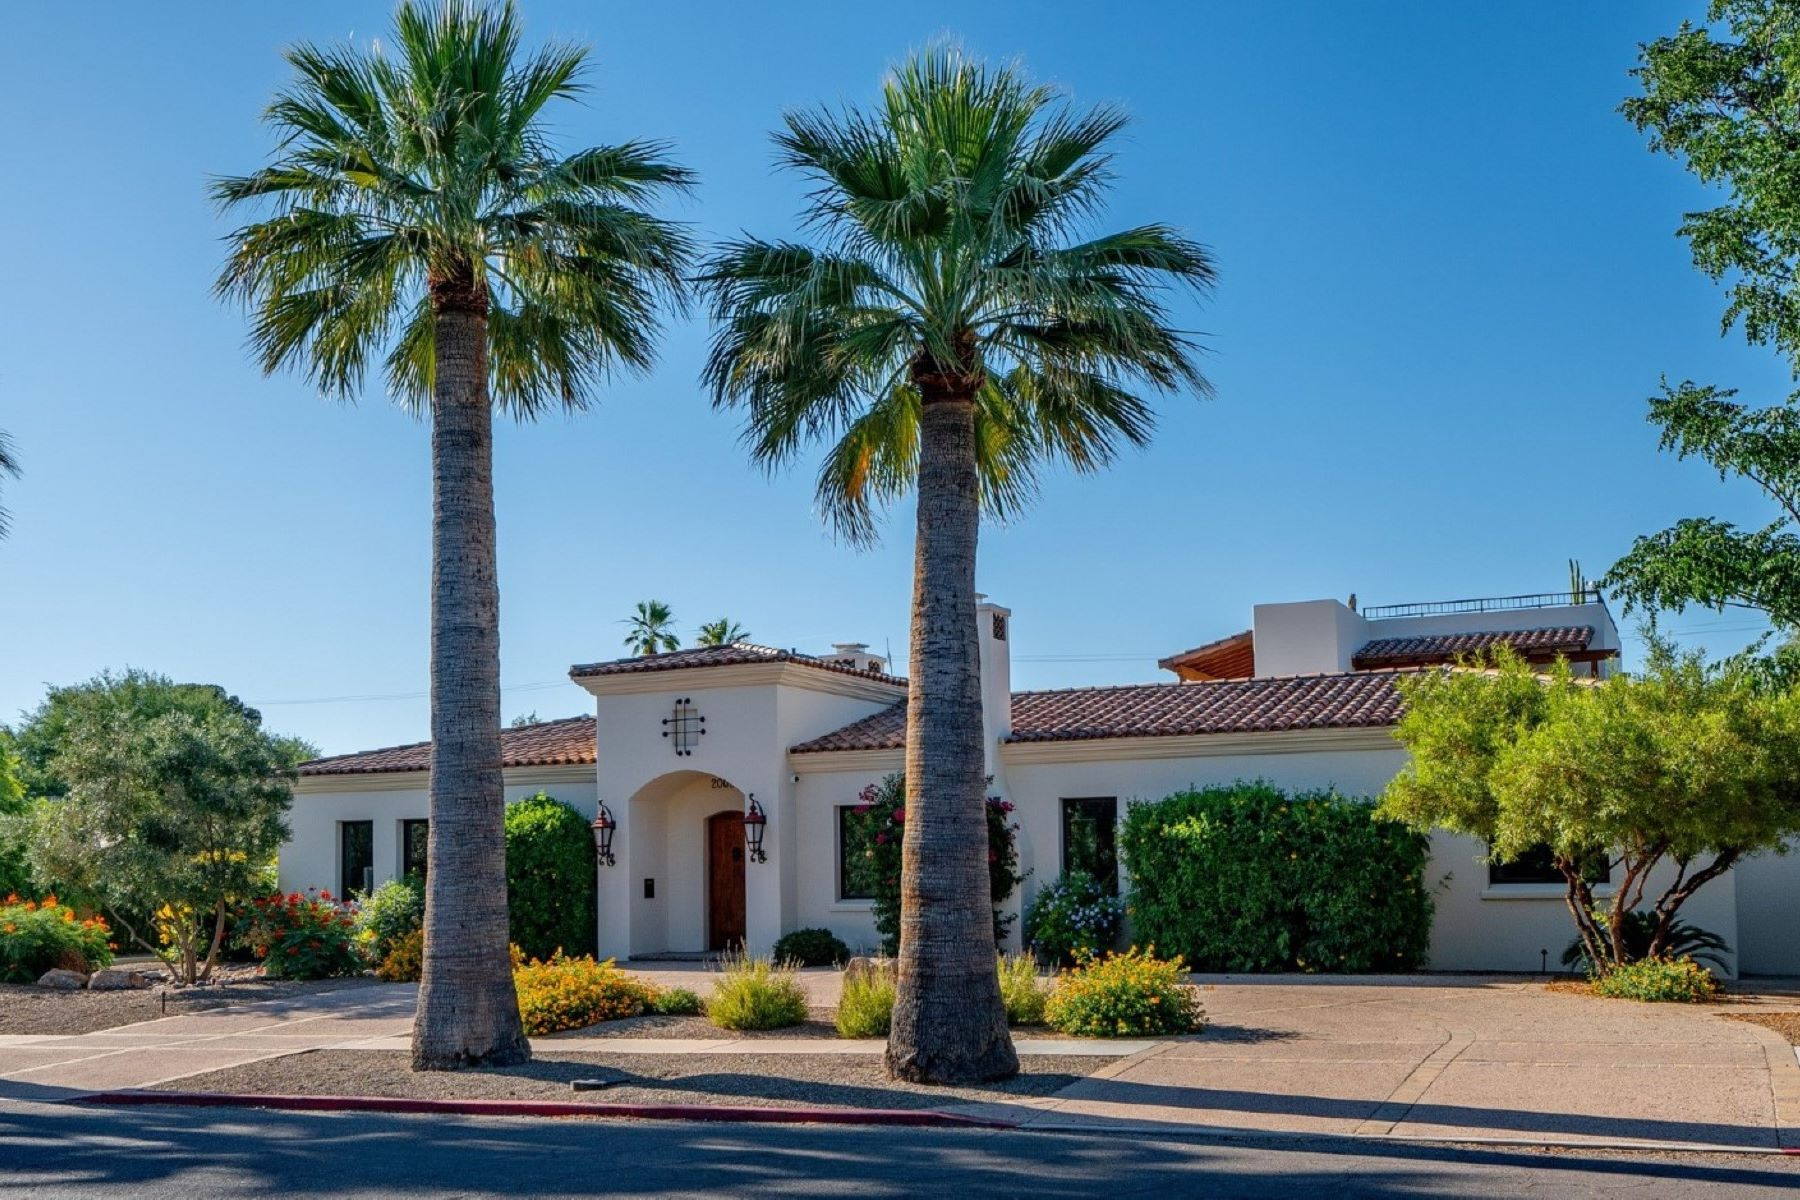 single family homes for Active at Elegant Santa Barbara Style Home & Casita 2003 E 5th Street Tucson, Arizona 85719 United States